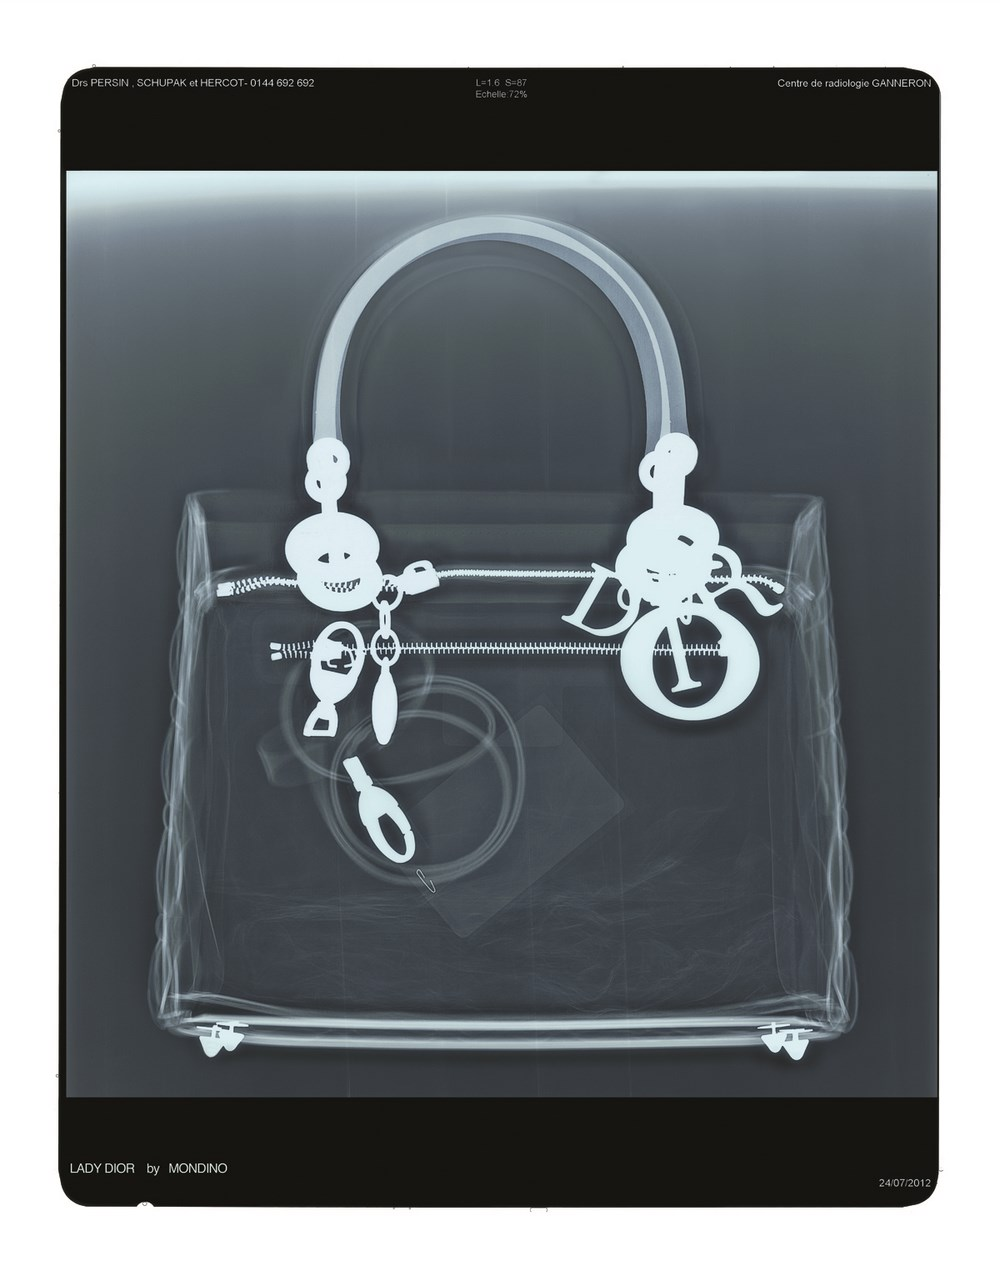 JEAN_BAPTISTE_MONDINO Lady Dior as seen by